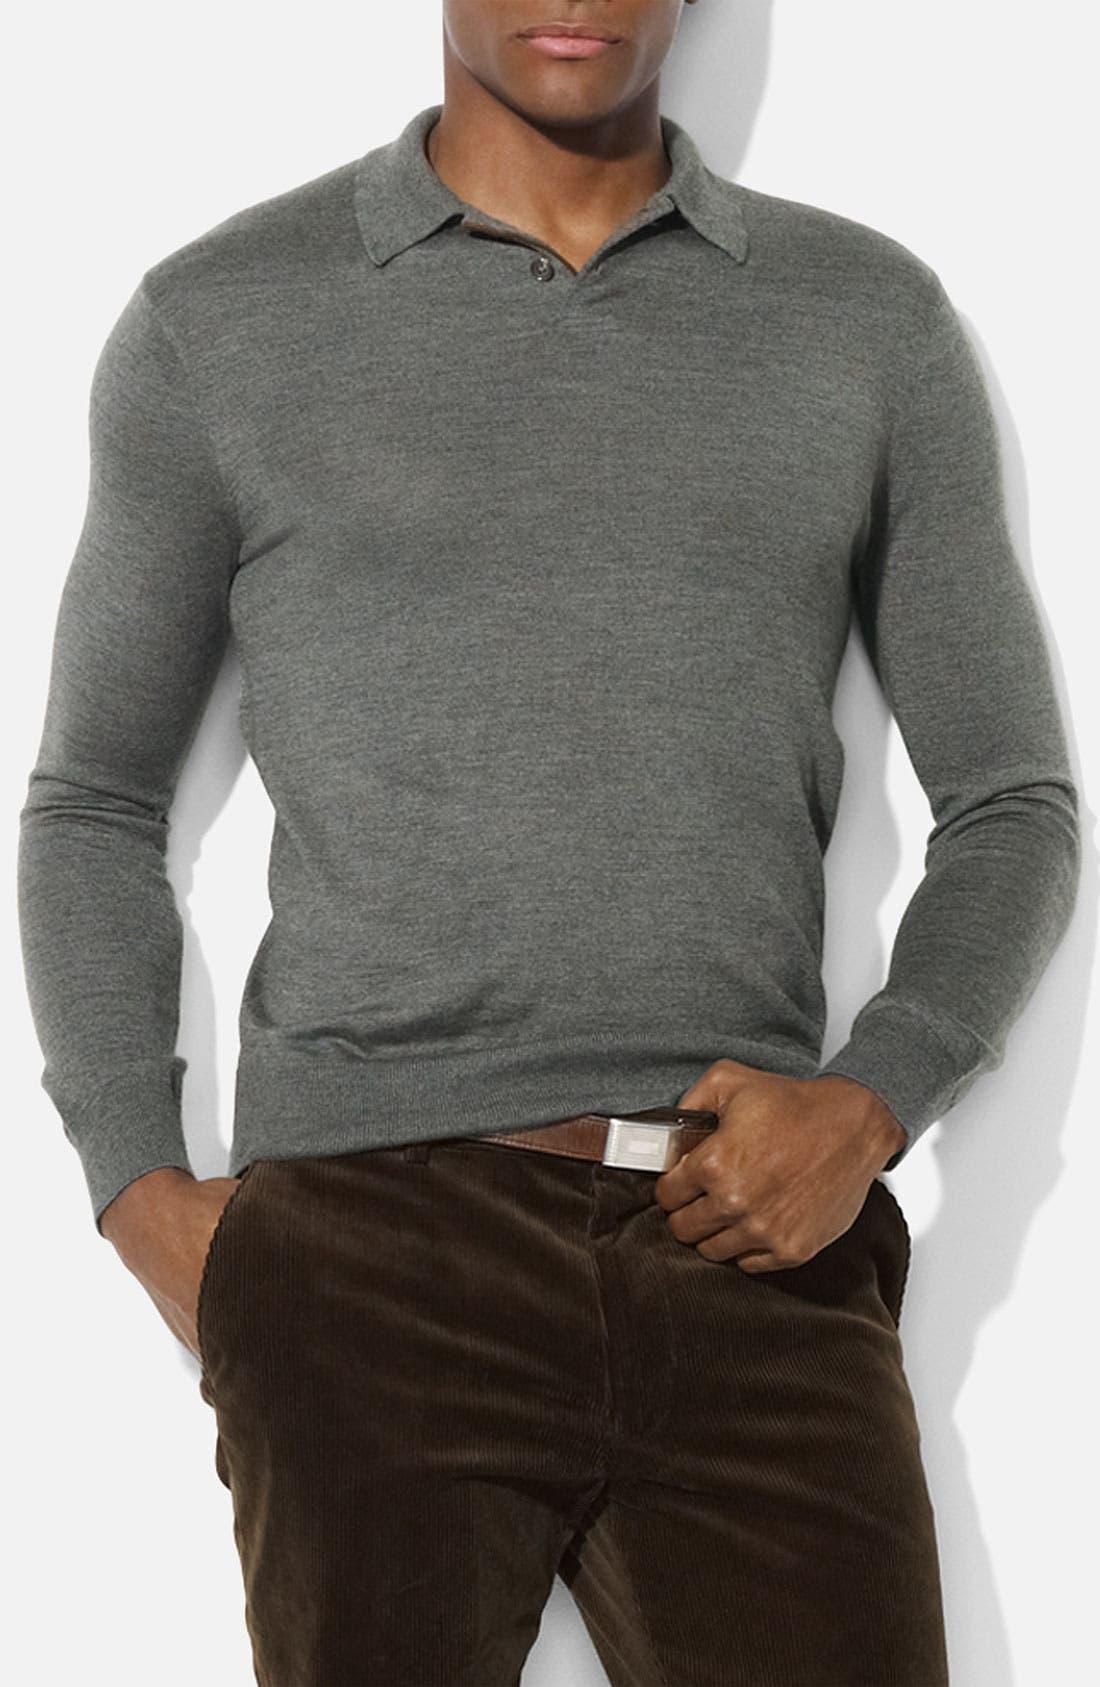 Main Image - Polo Ralph Lauren Trim Fit Polo Sweater